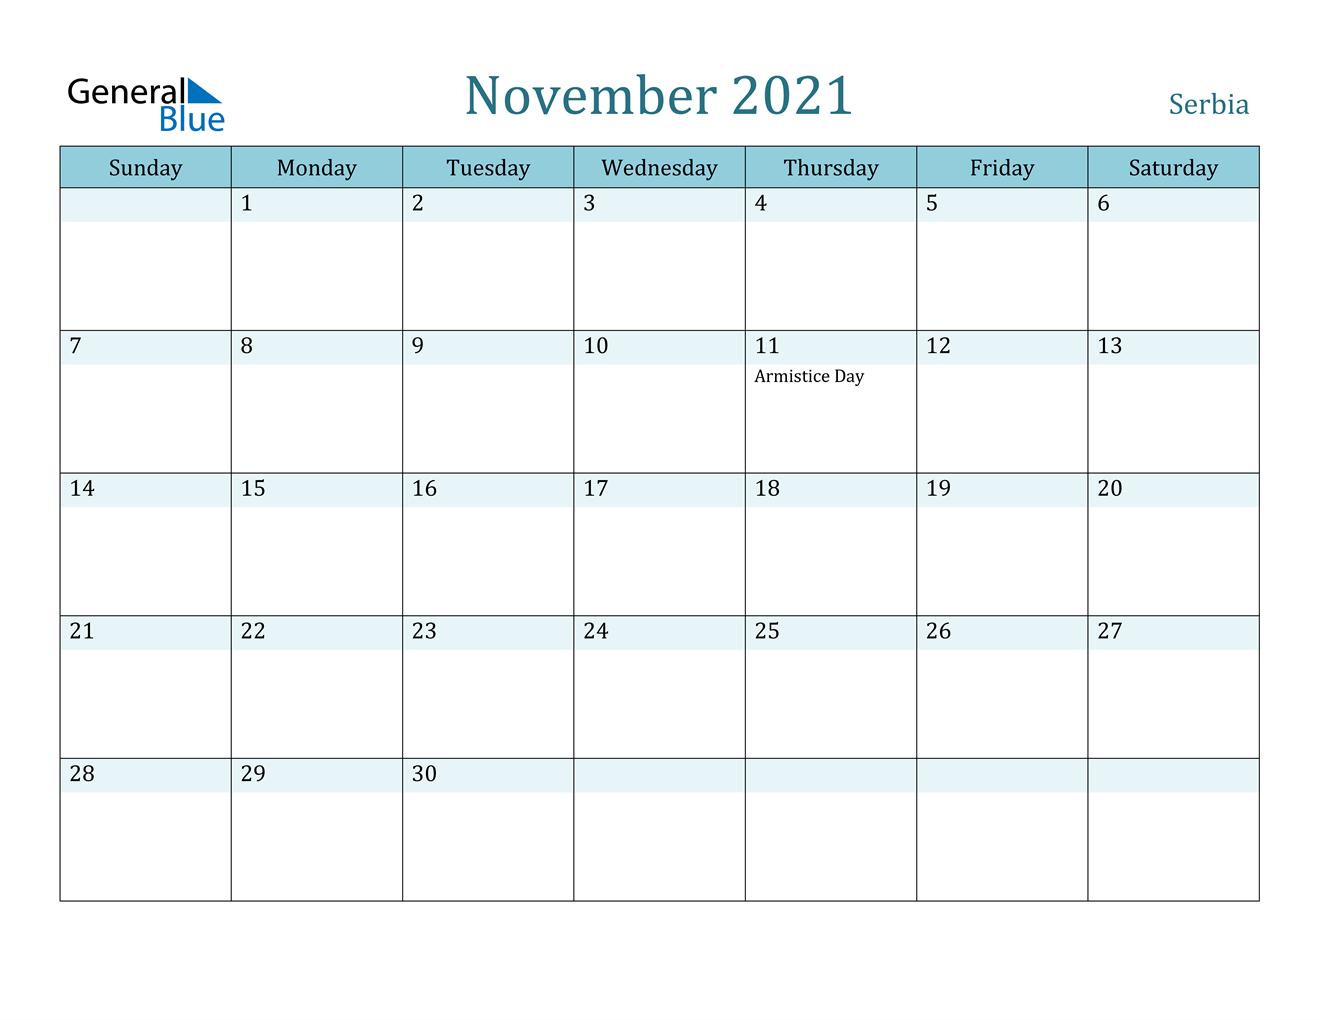 November 2021 Calendar - Serbia